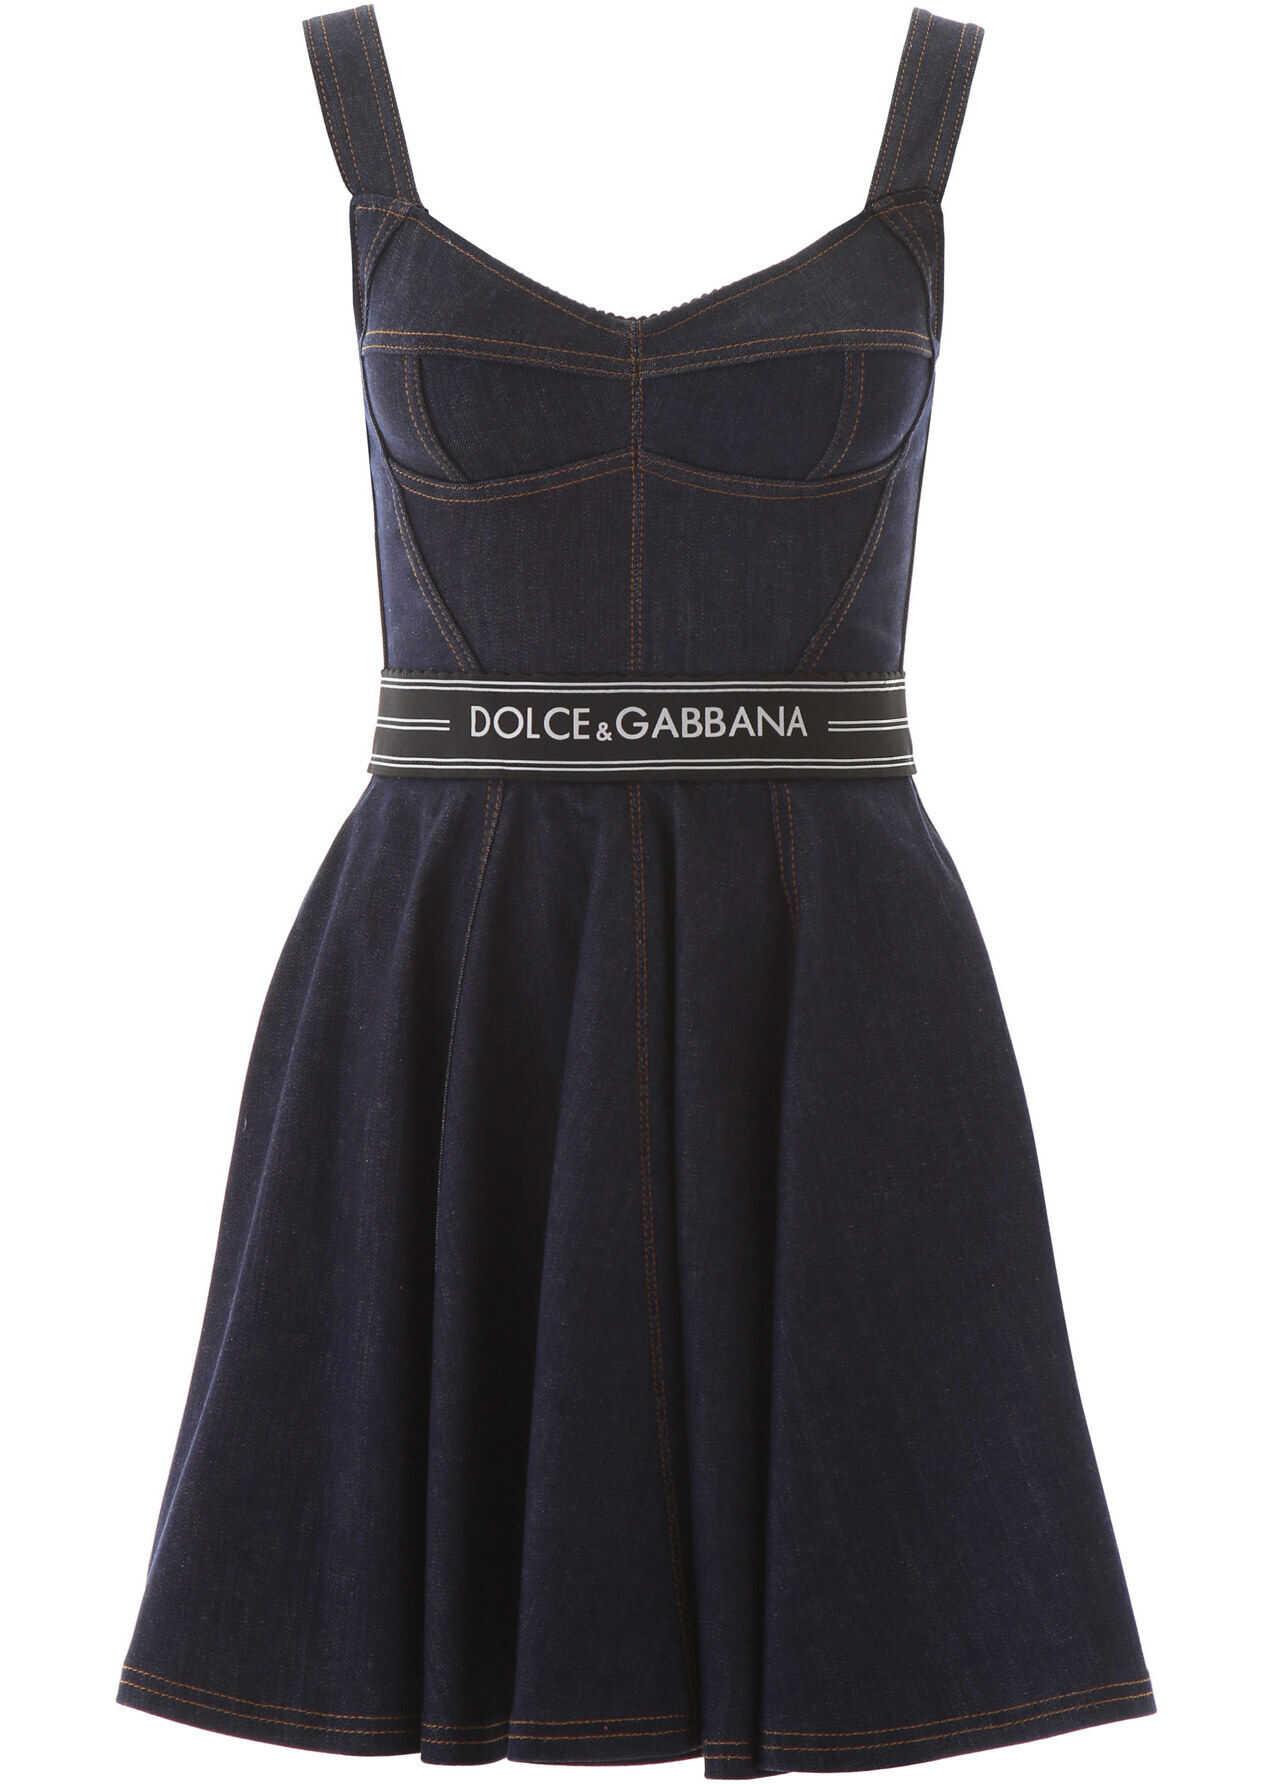 Dolce & Gabbana Denim Mini Dress With Logo VARIANTE ABBINATA